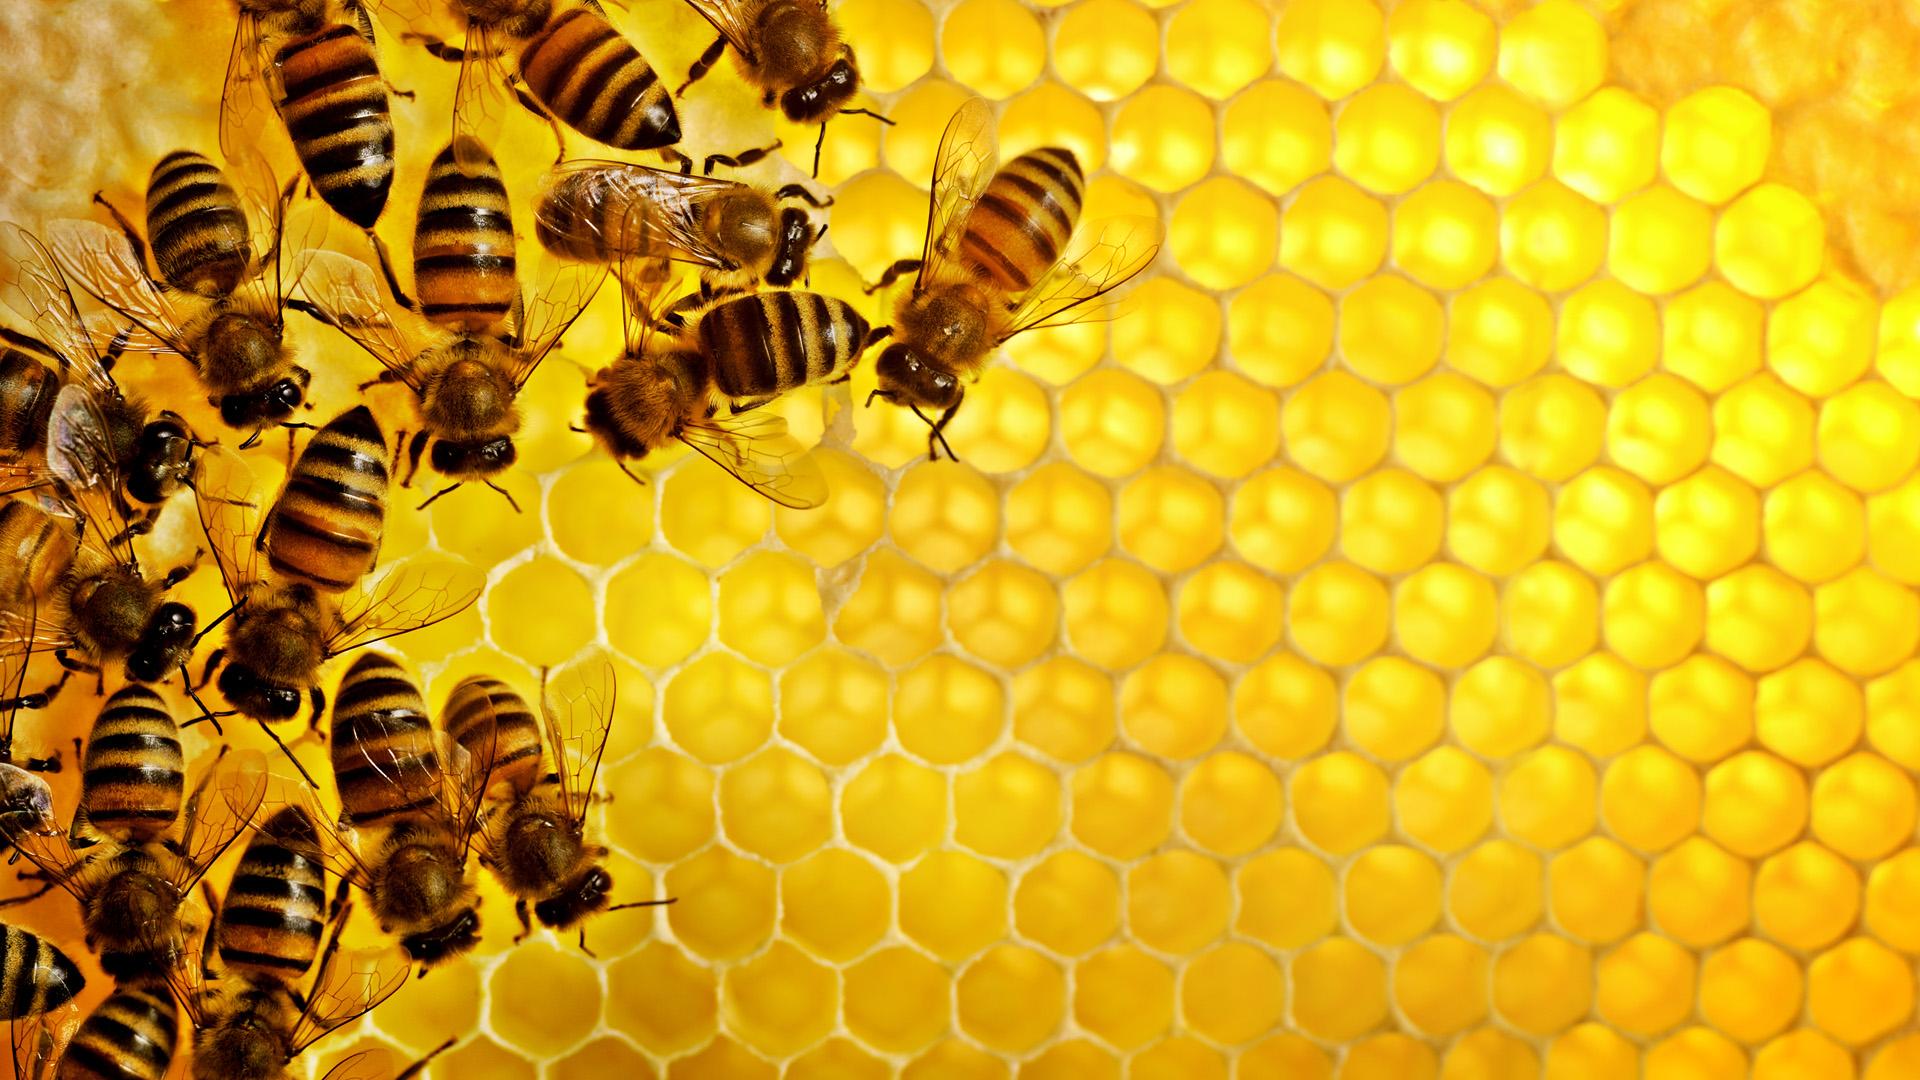 Honey bees Sweden --- Image by © Jonn/Johnér Images/Corbis